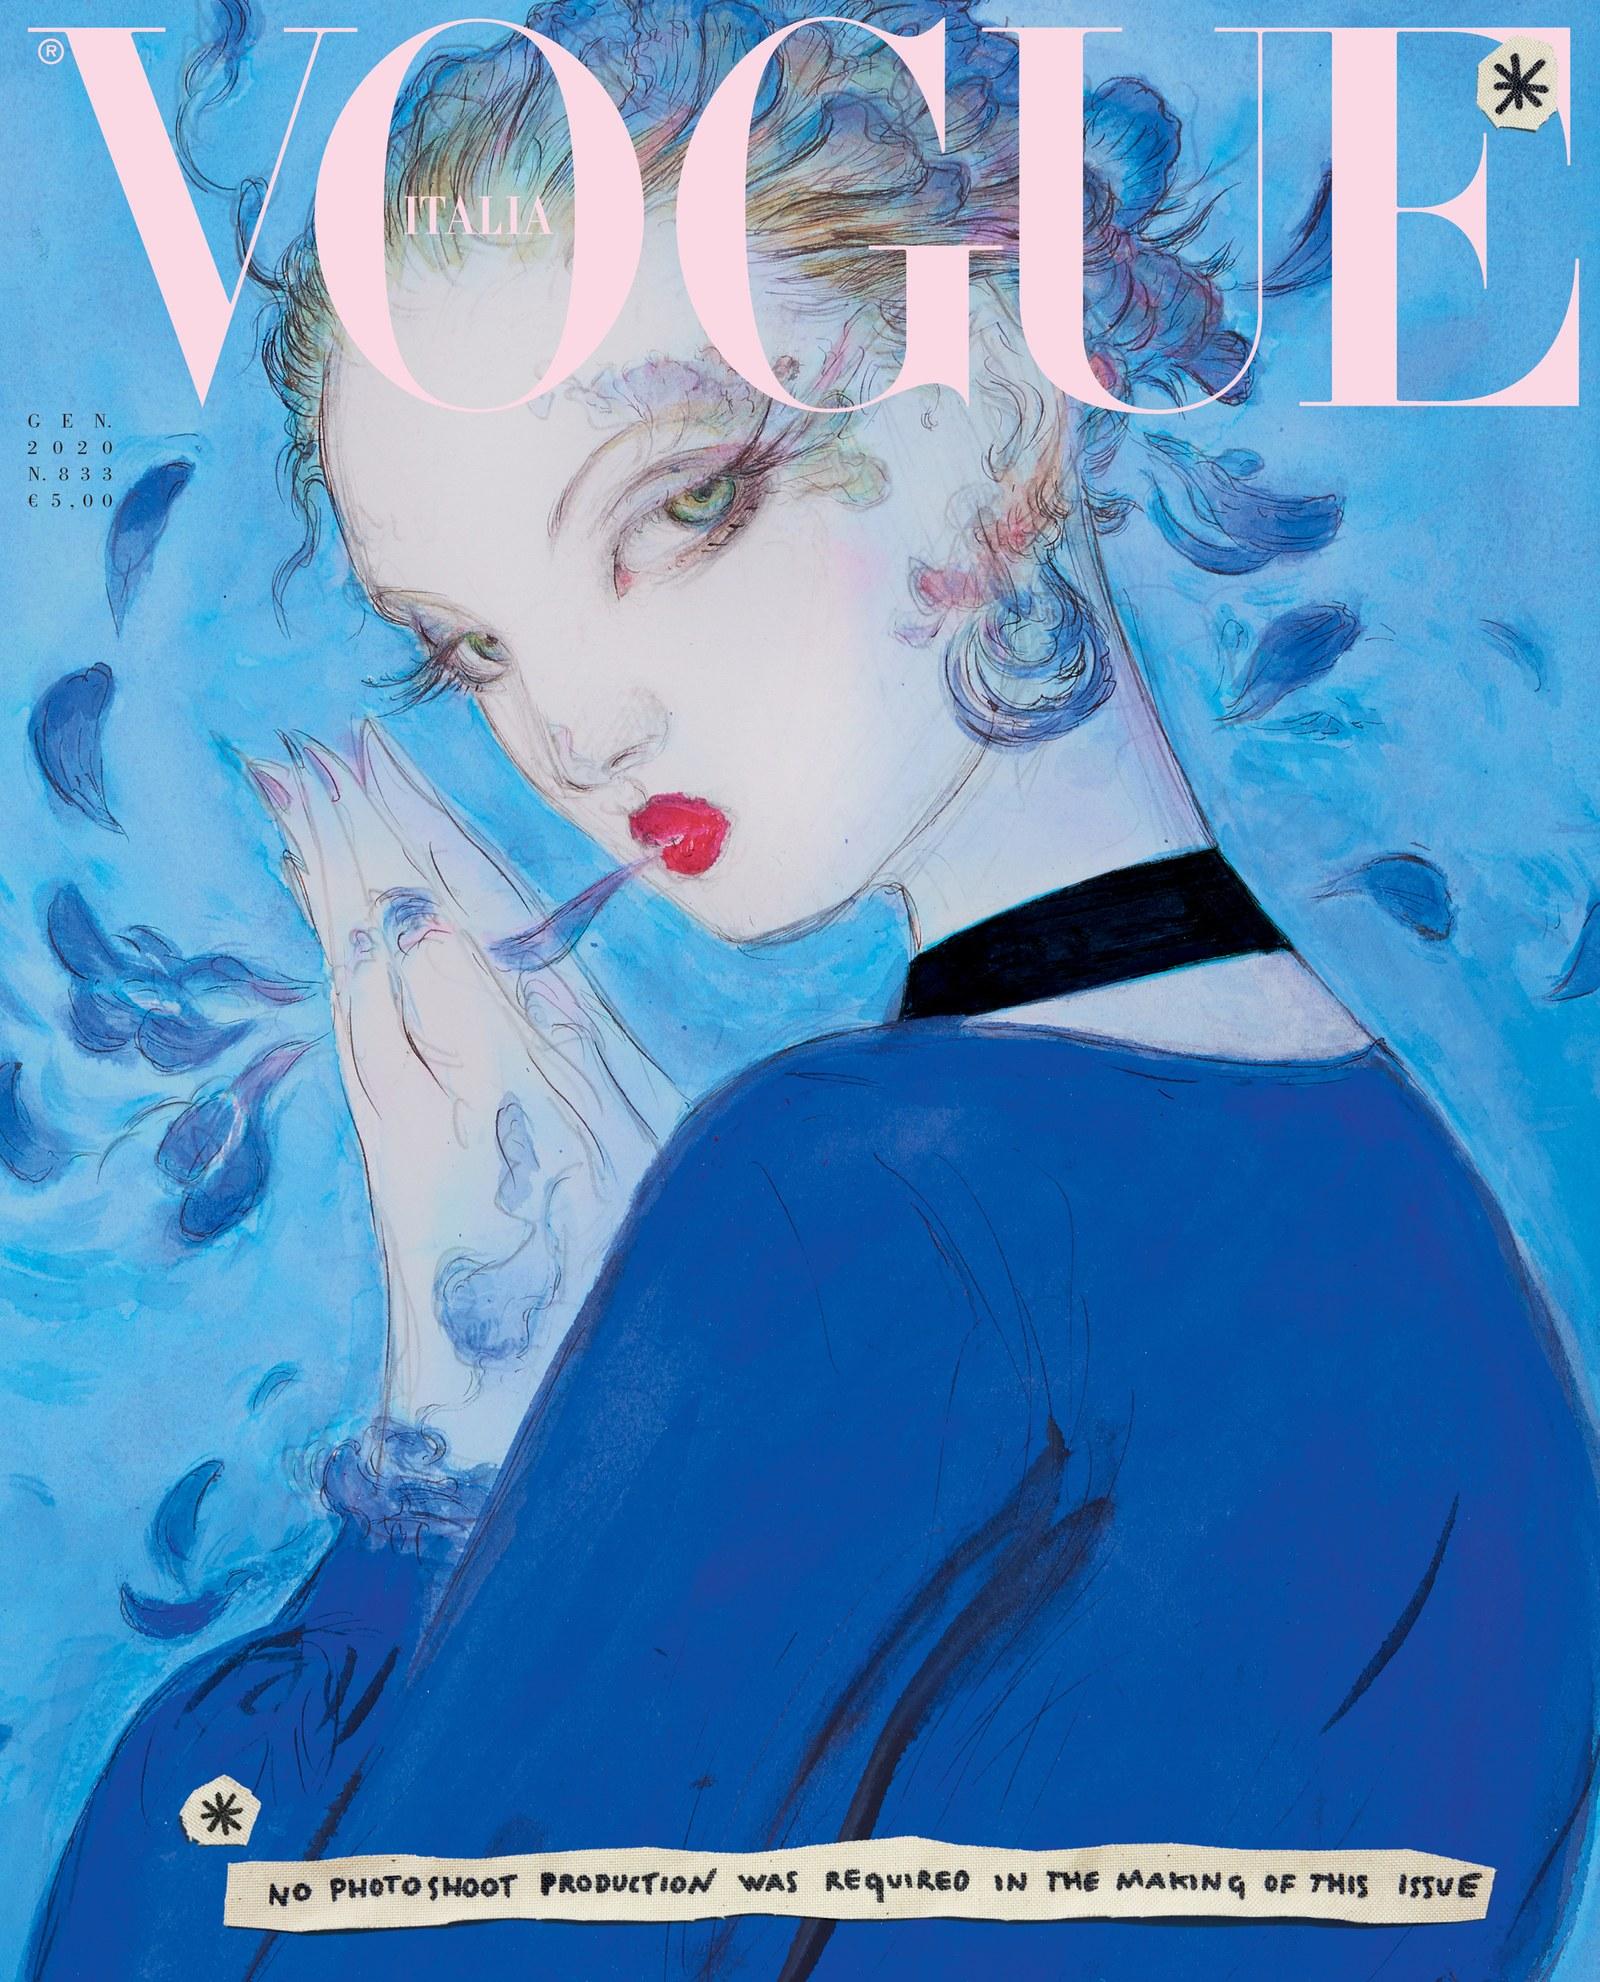 0833_VI_2001_WELL_COVER5_YOSHITAKA_AMANO